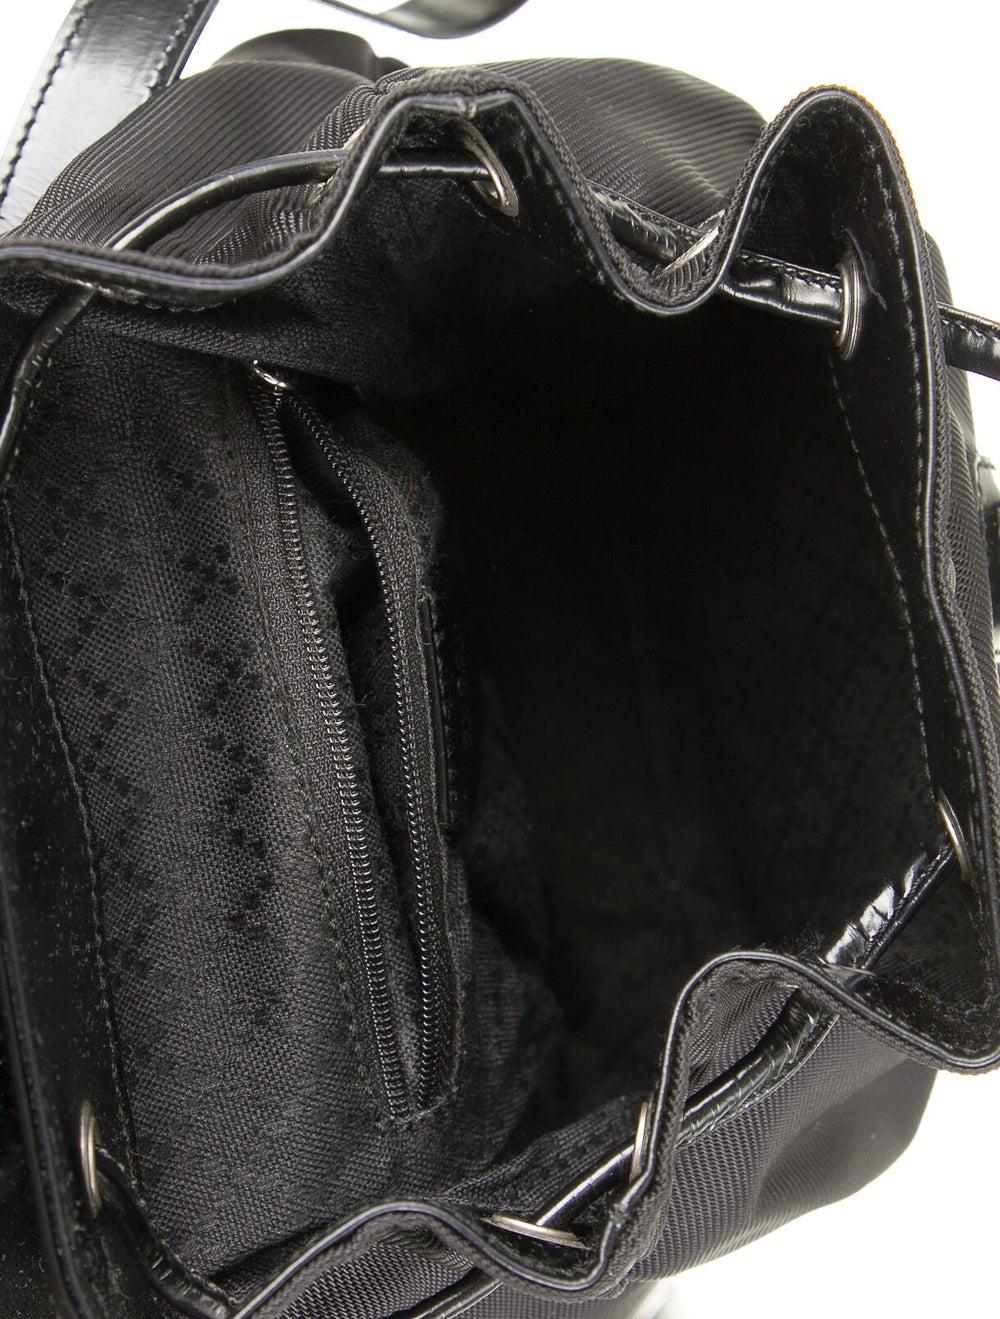 Gucci Vintage Nylon Bamboo Backpack Black - image 5